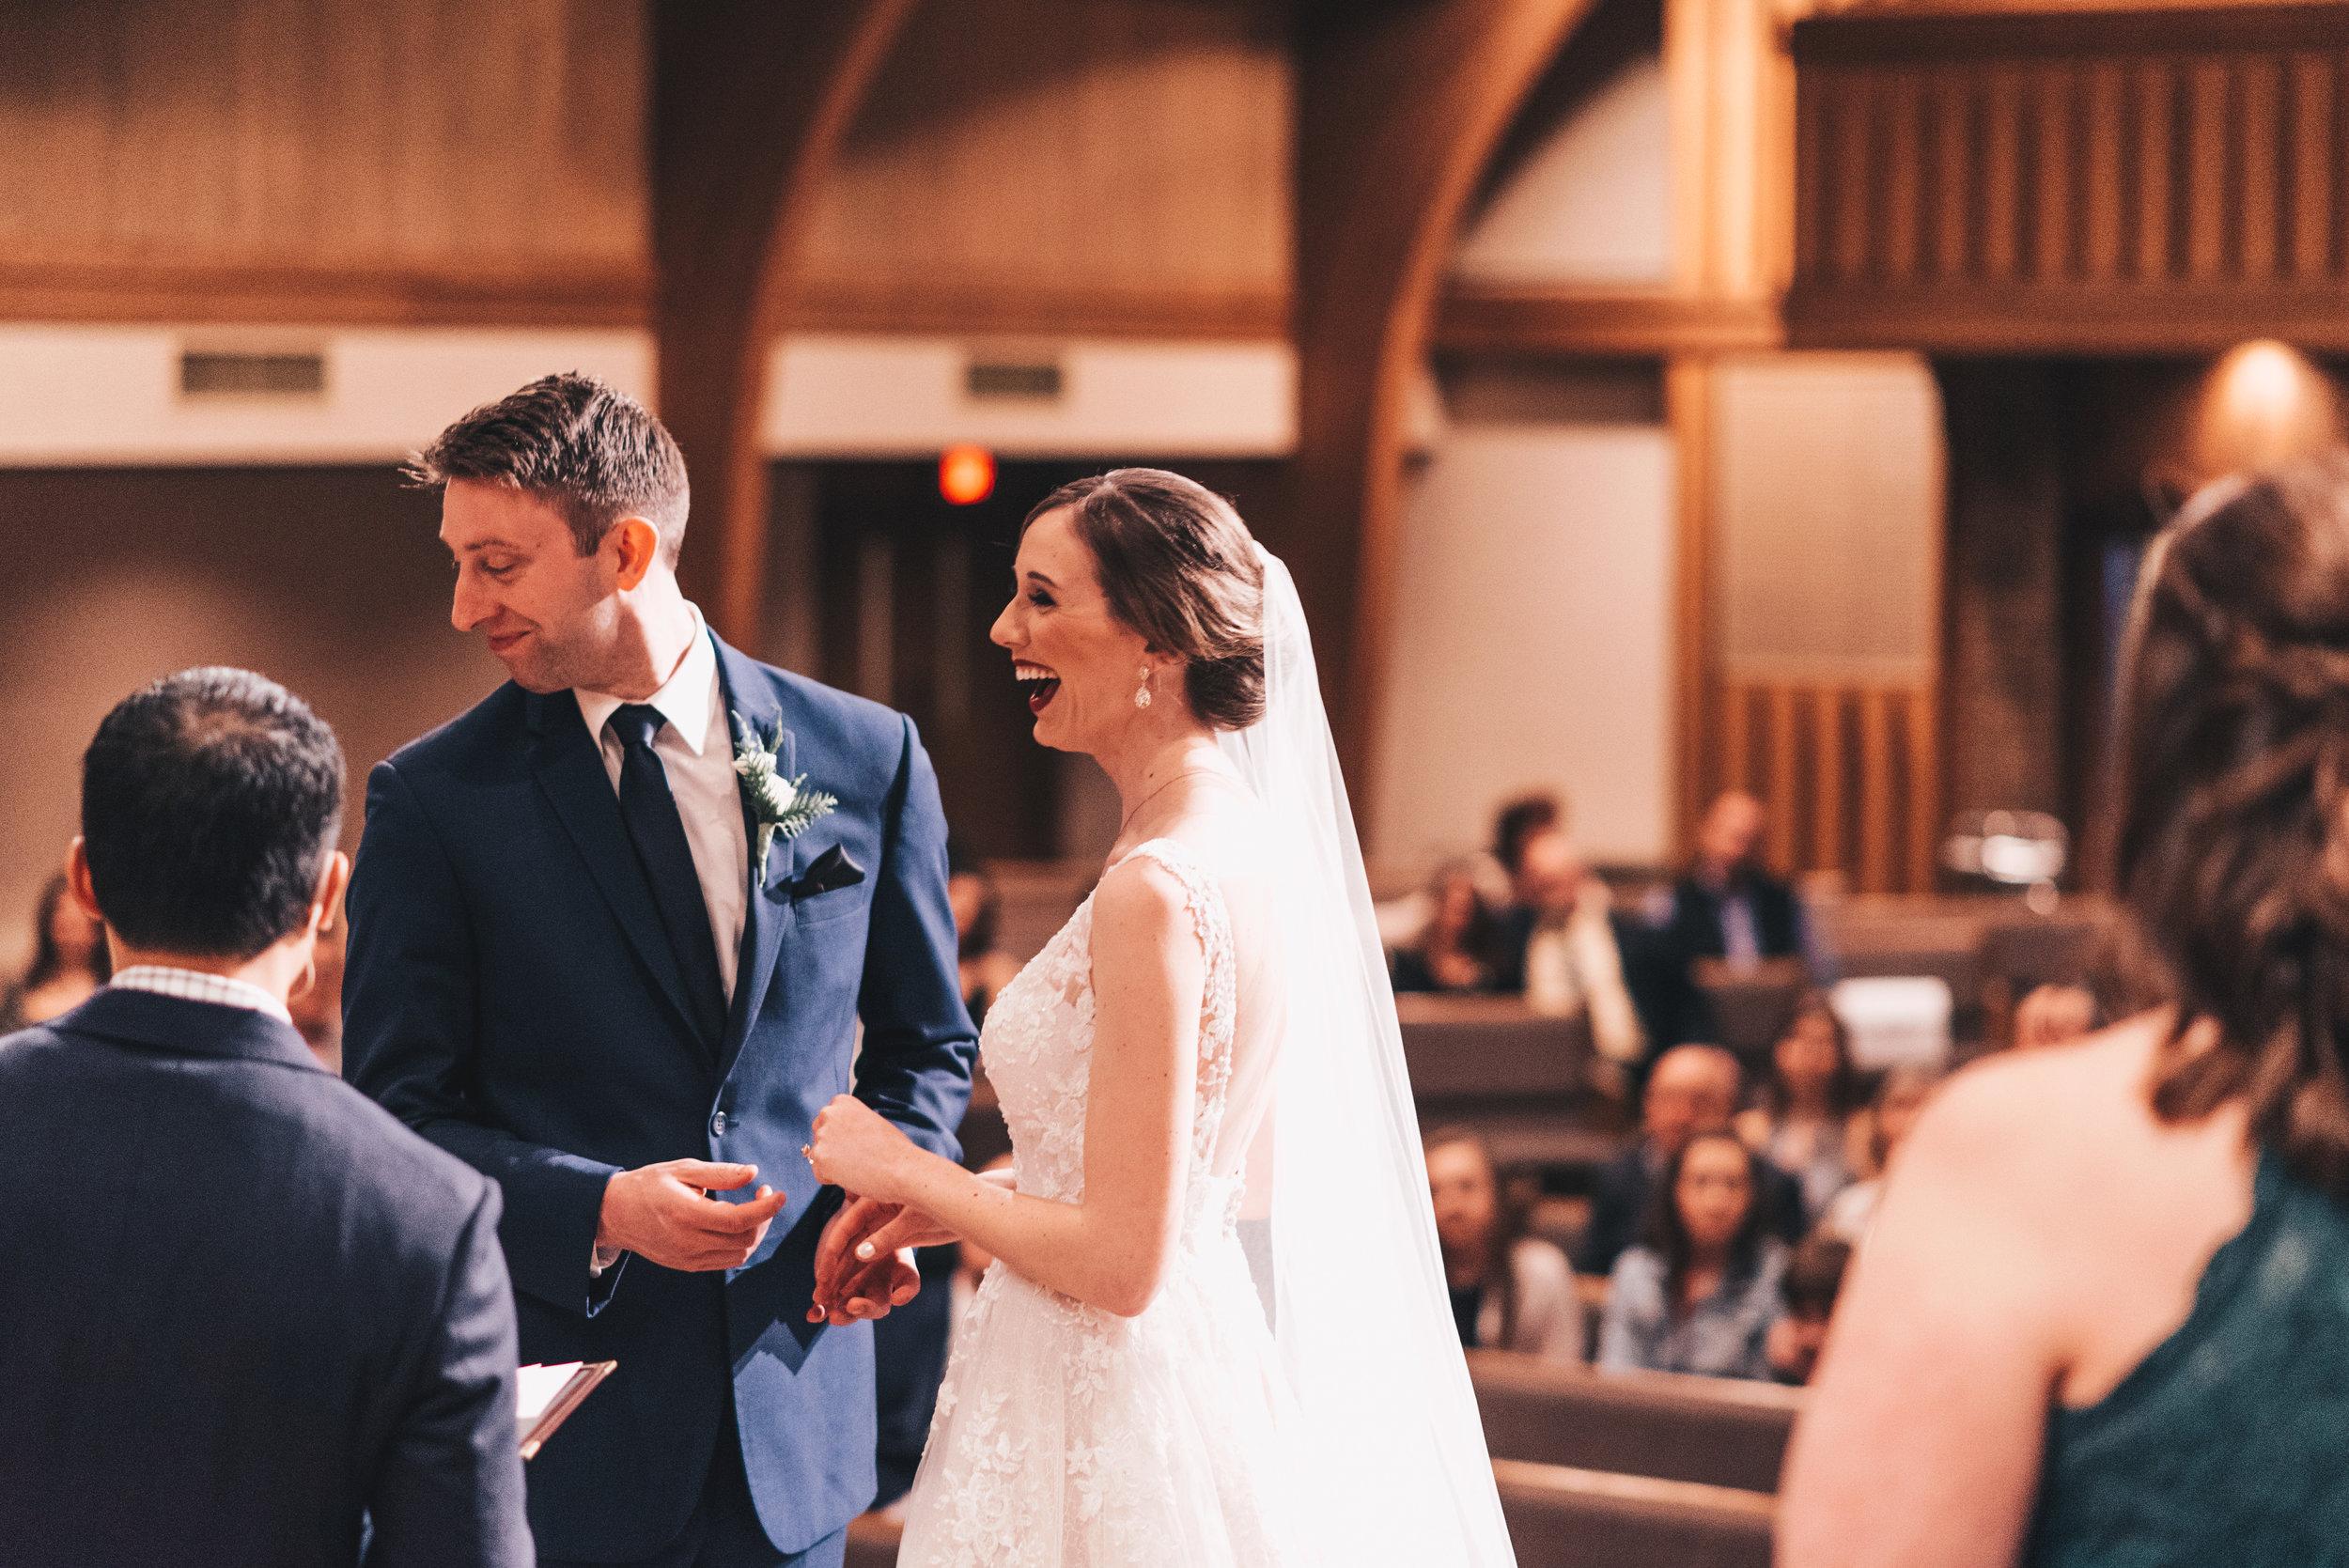 Winter Wedding, Chicago Winter Wedding, Chicago Wedding Photographer, Illinois Wedding, Illinois Wedding Photographer, Classy Modern Wedding, Ceremony Photography, Ceremony Photos